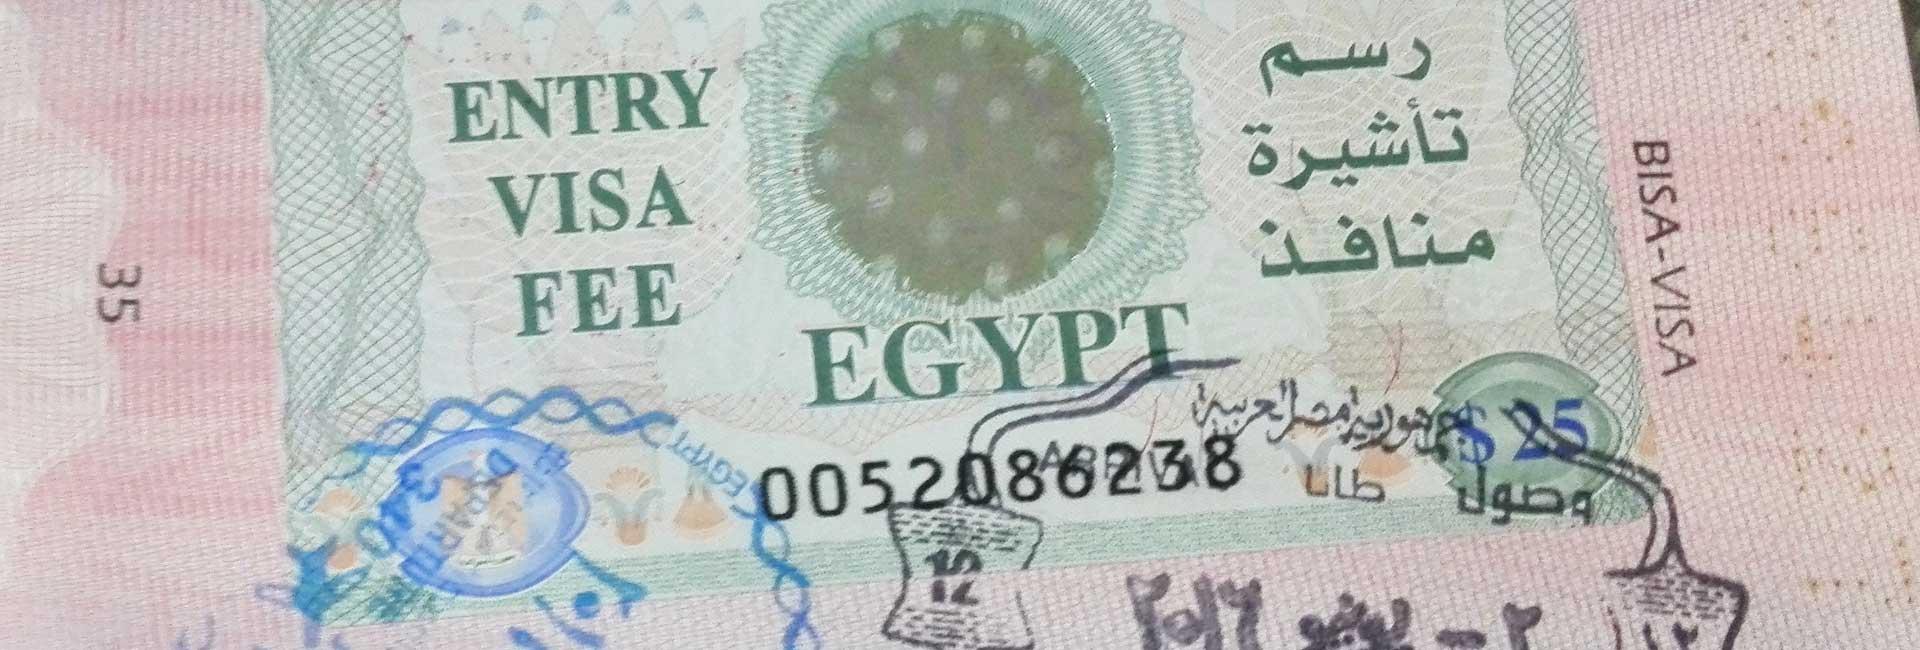 Egypt Passports And Visas